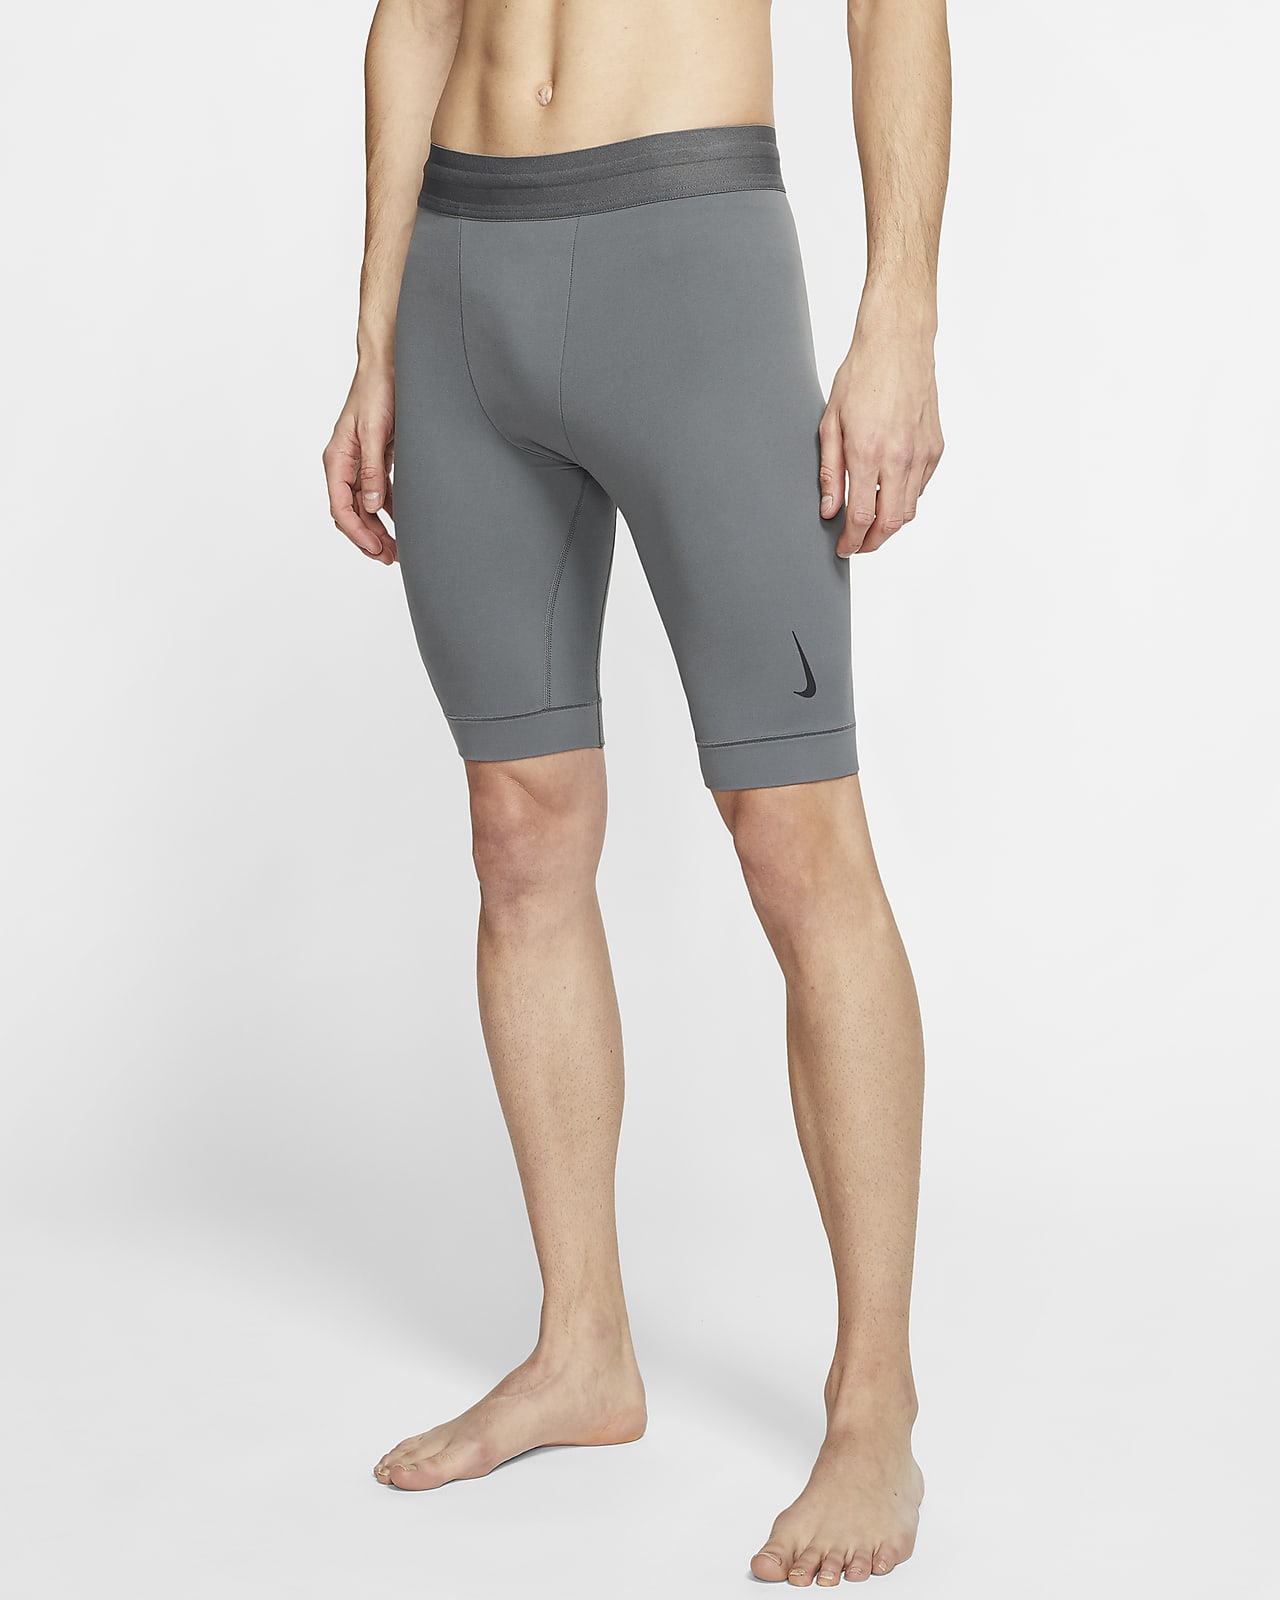 Nike Yoga Infinalon Dri-FIT Herrenshorts